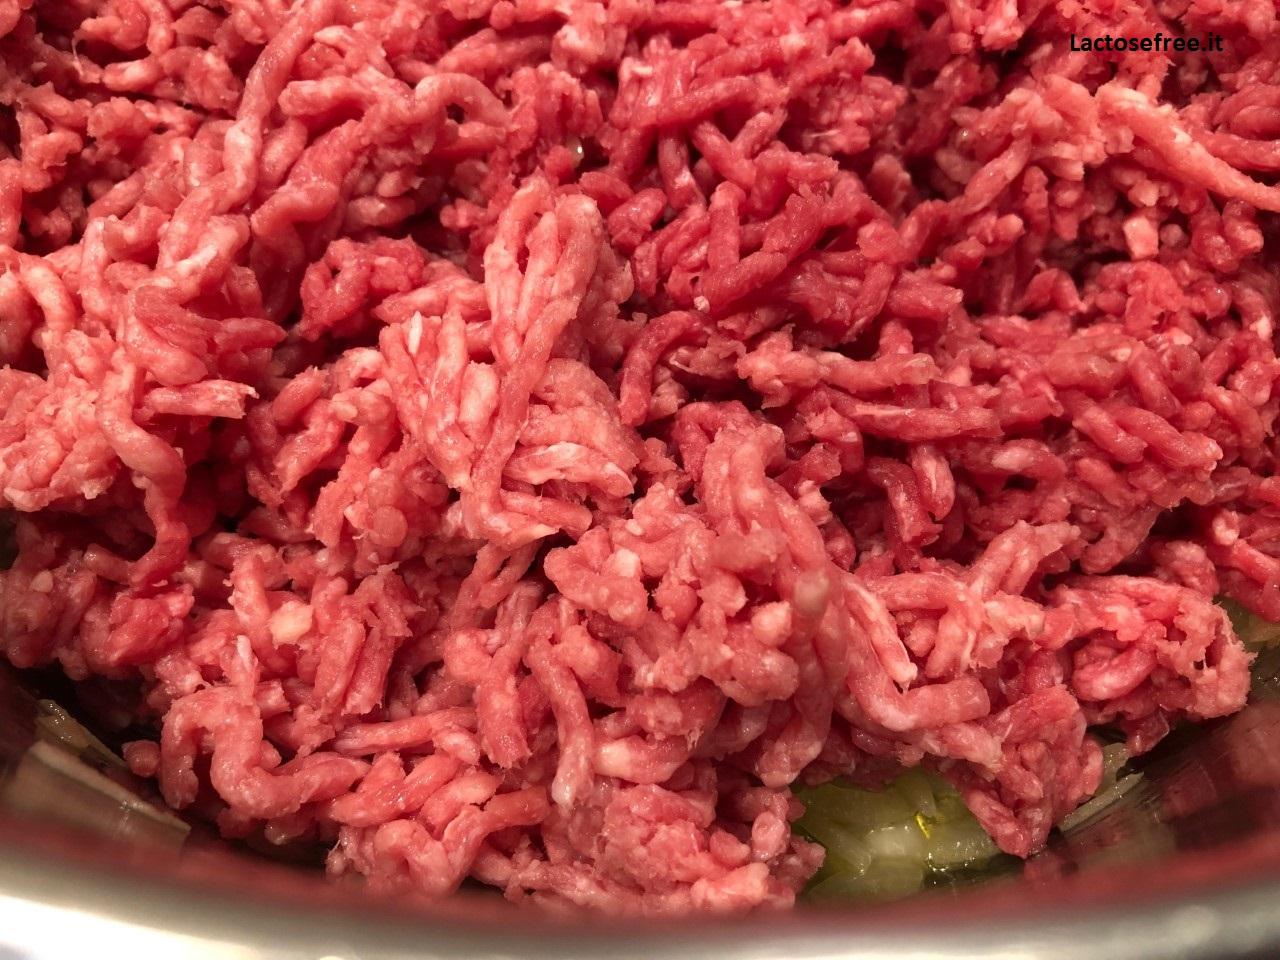 Unire la carne macinata